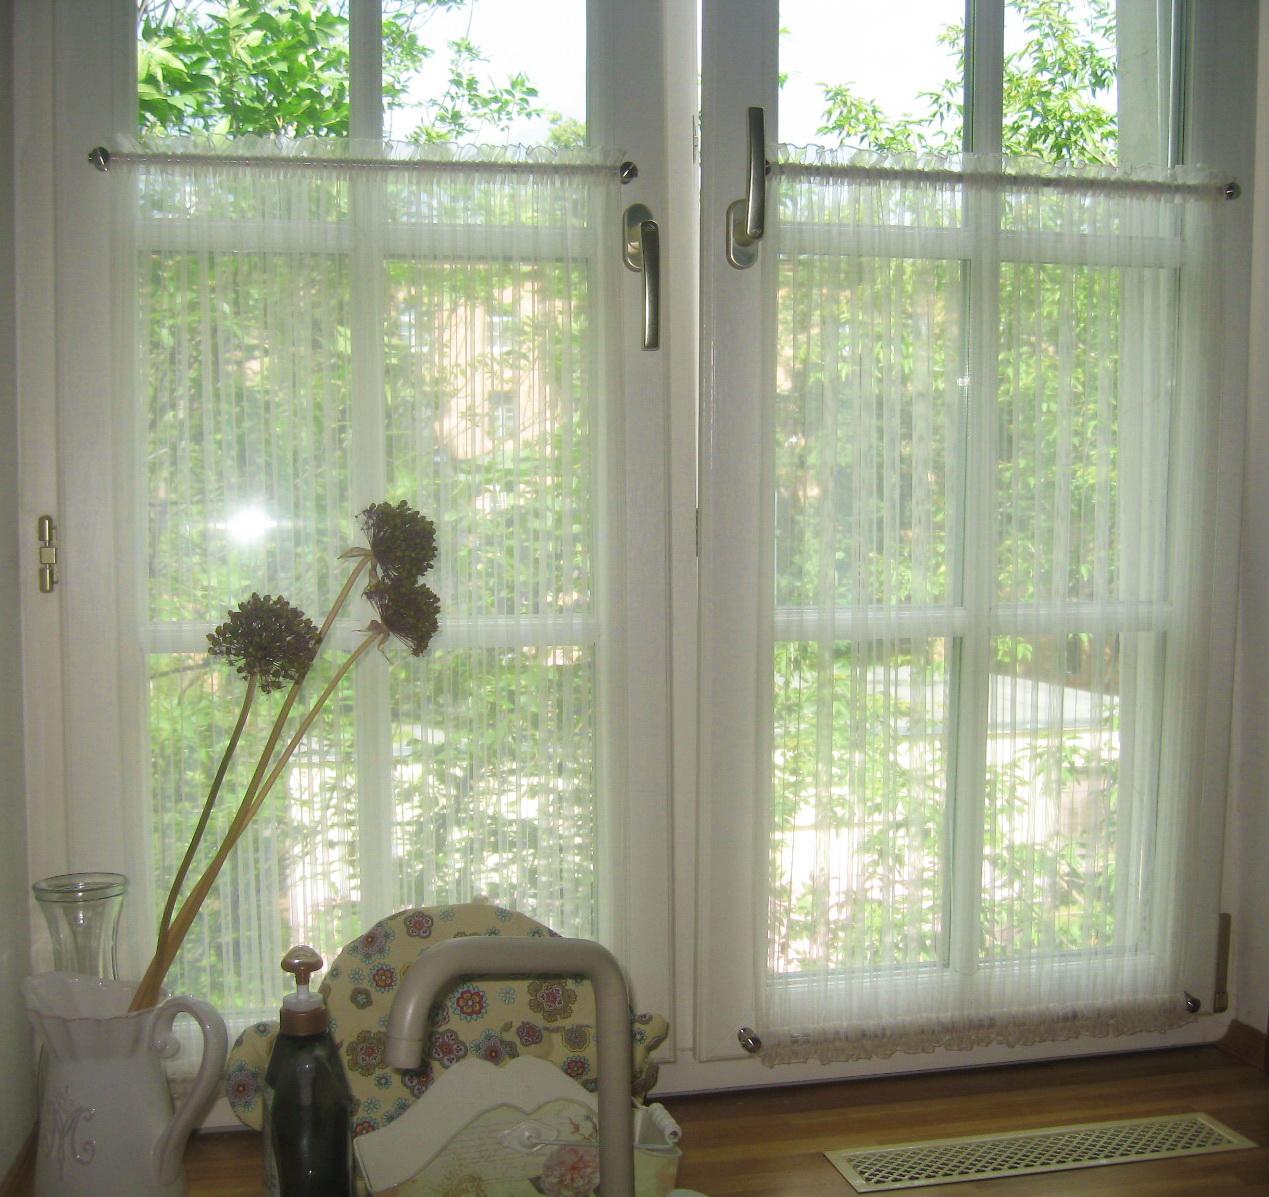 Шторы в стиле кафе на двустворчатом окне